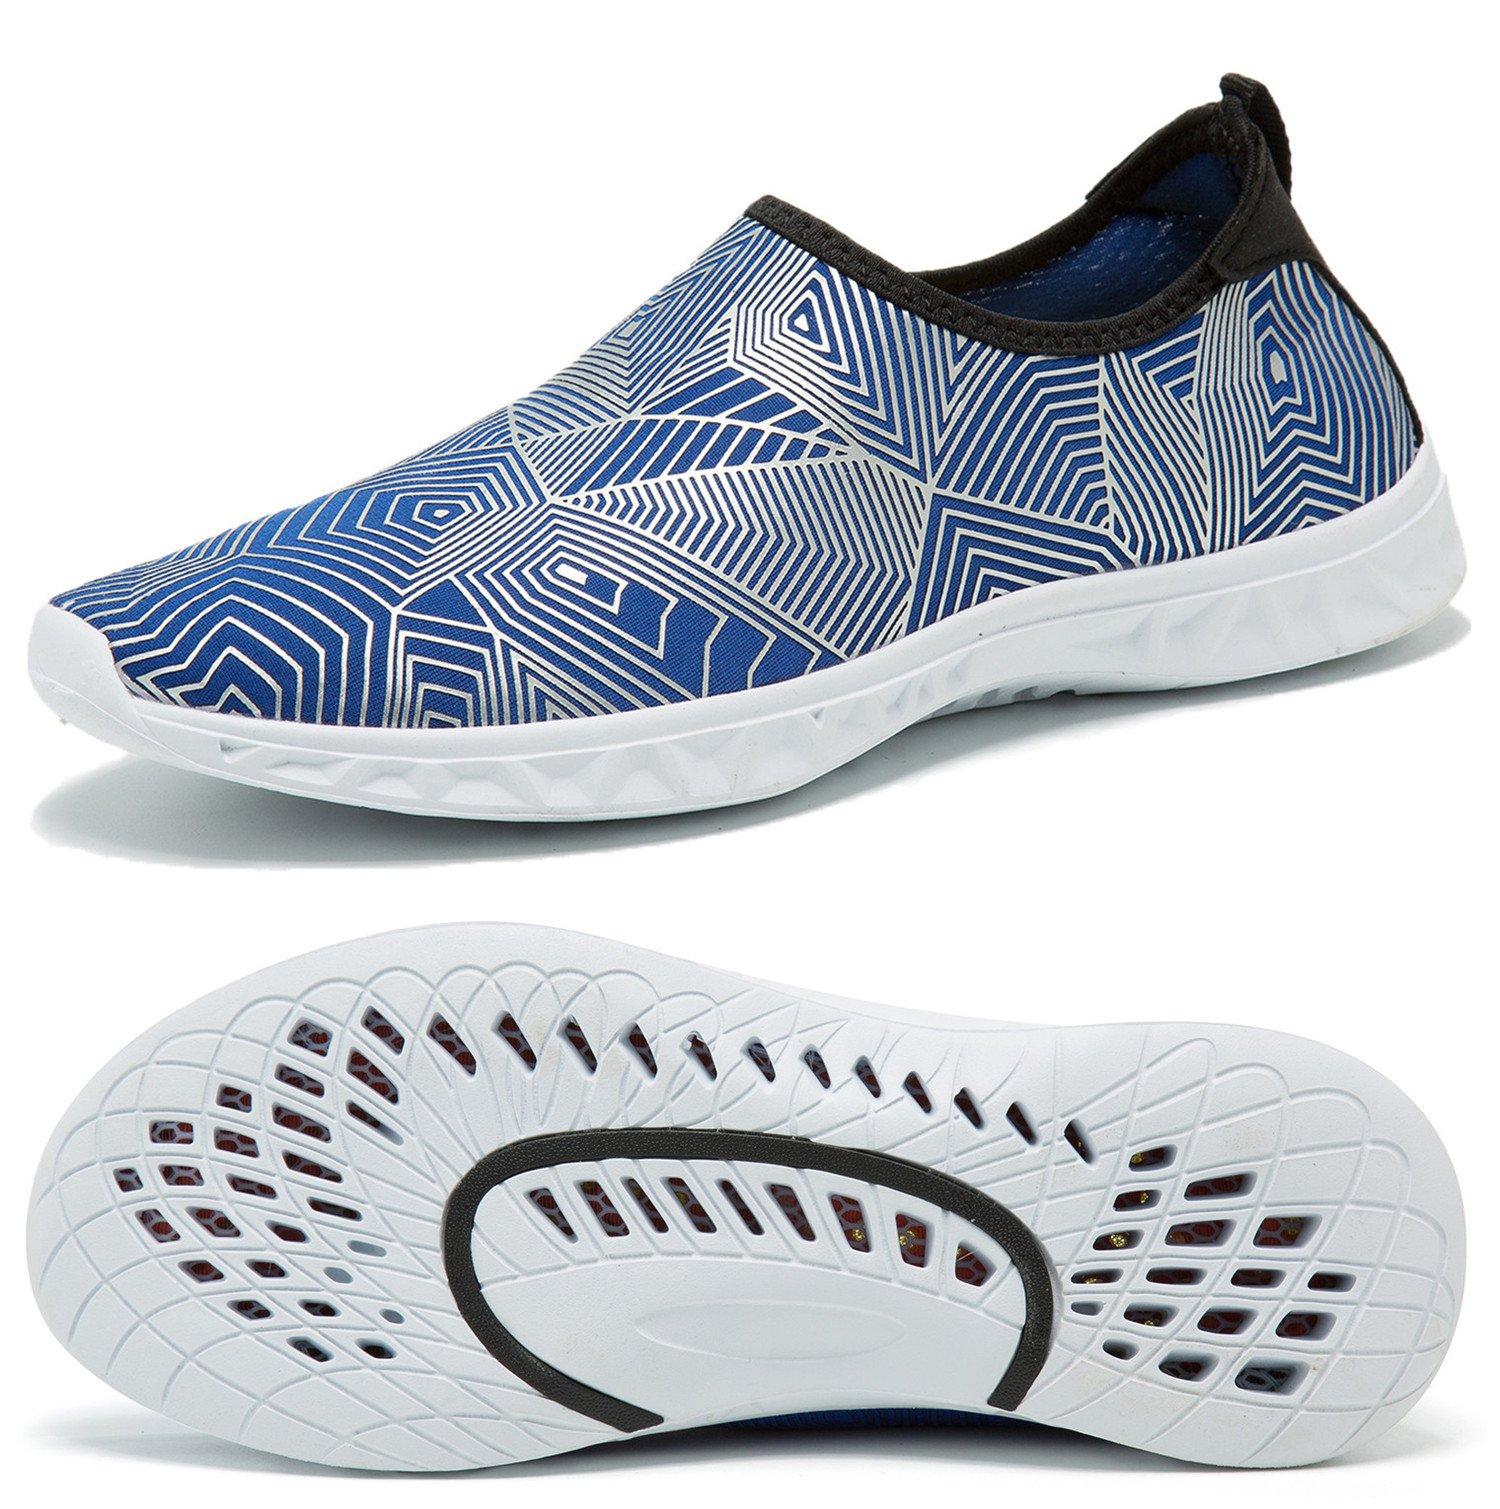 RUNSOON Men Women Water Shoes for Beach Swim Diving Aqua Sport Boating Sailing Surfing Walking Yoga Exercise, S06 Silver Blue 46